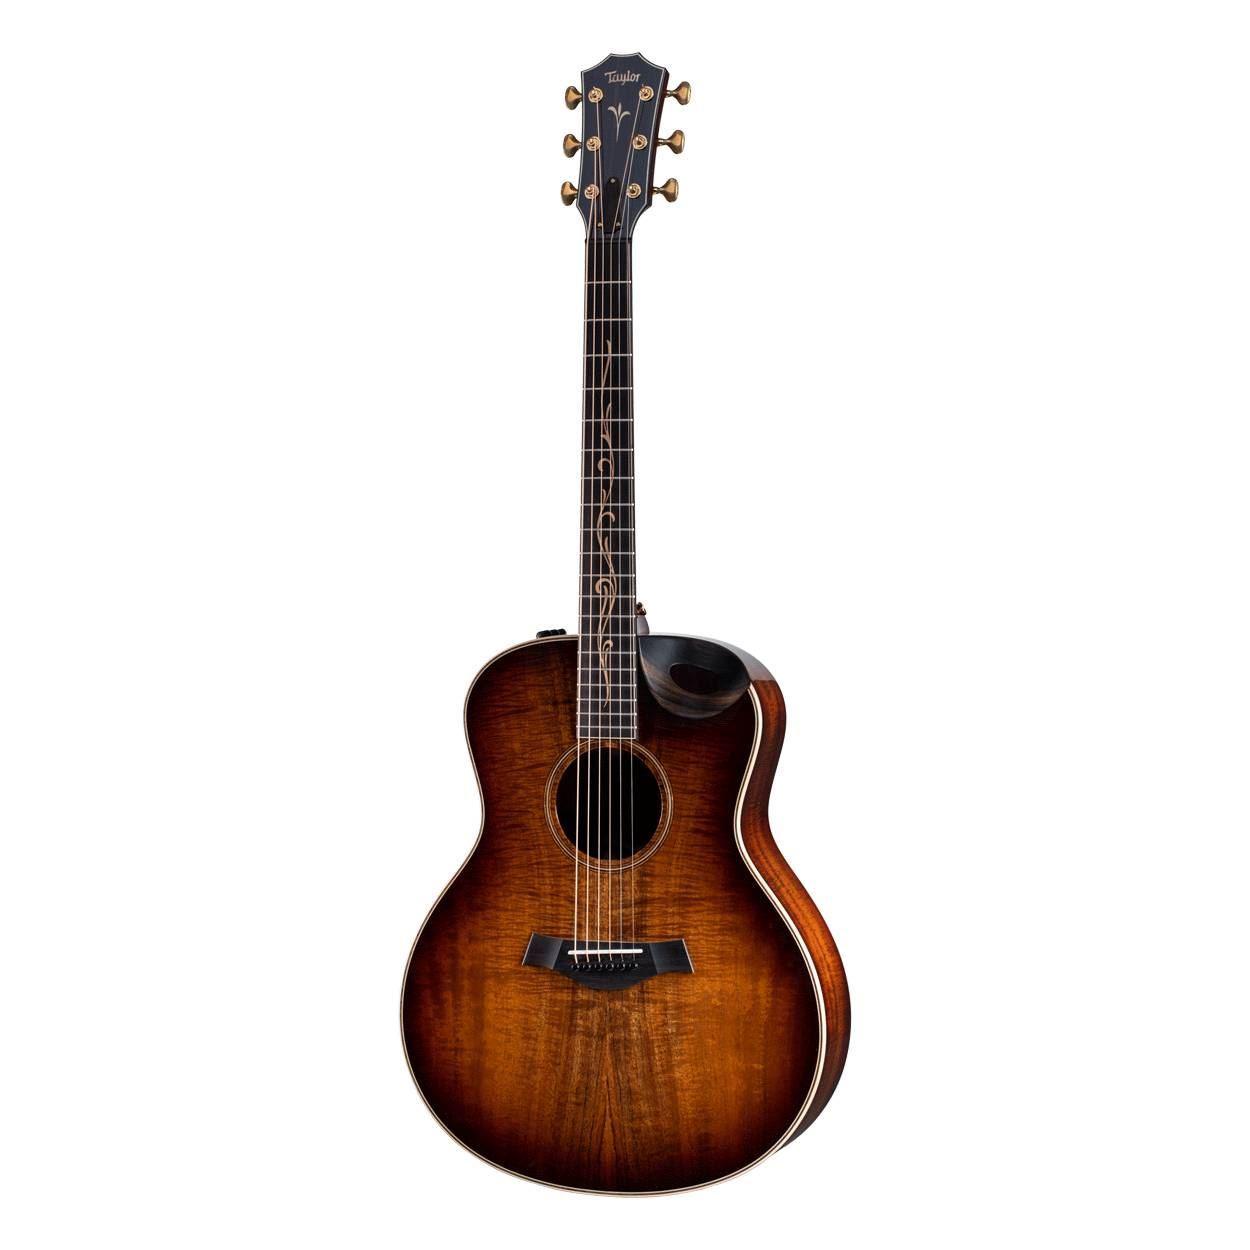 Taylor K26ce Koa/Koa Acoustic Guitar with Pickup and Cutaway - Perth | Mega Music Online